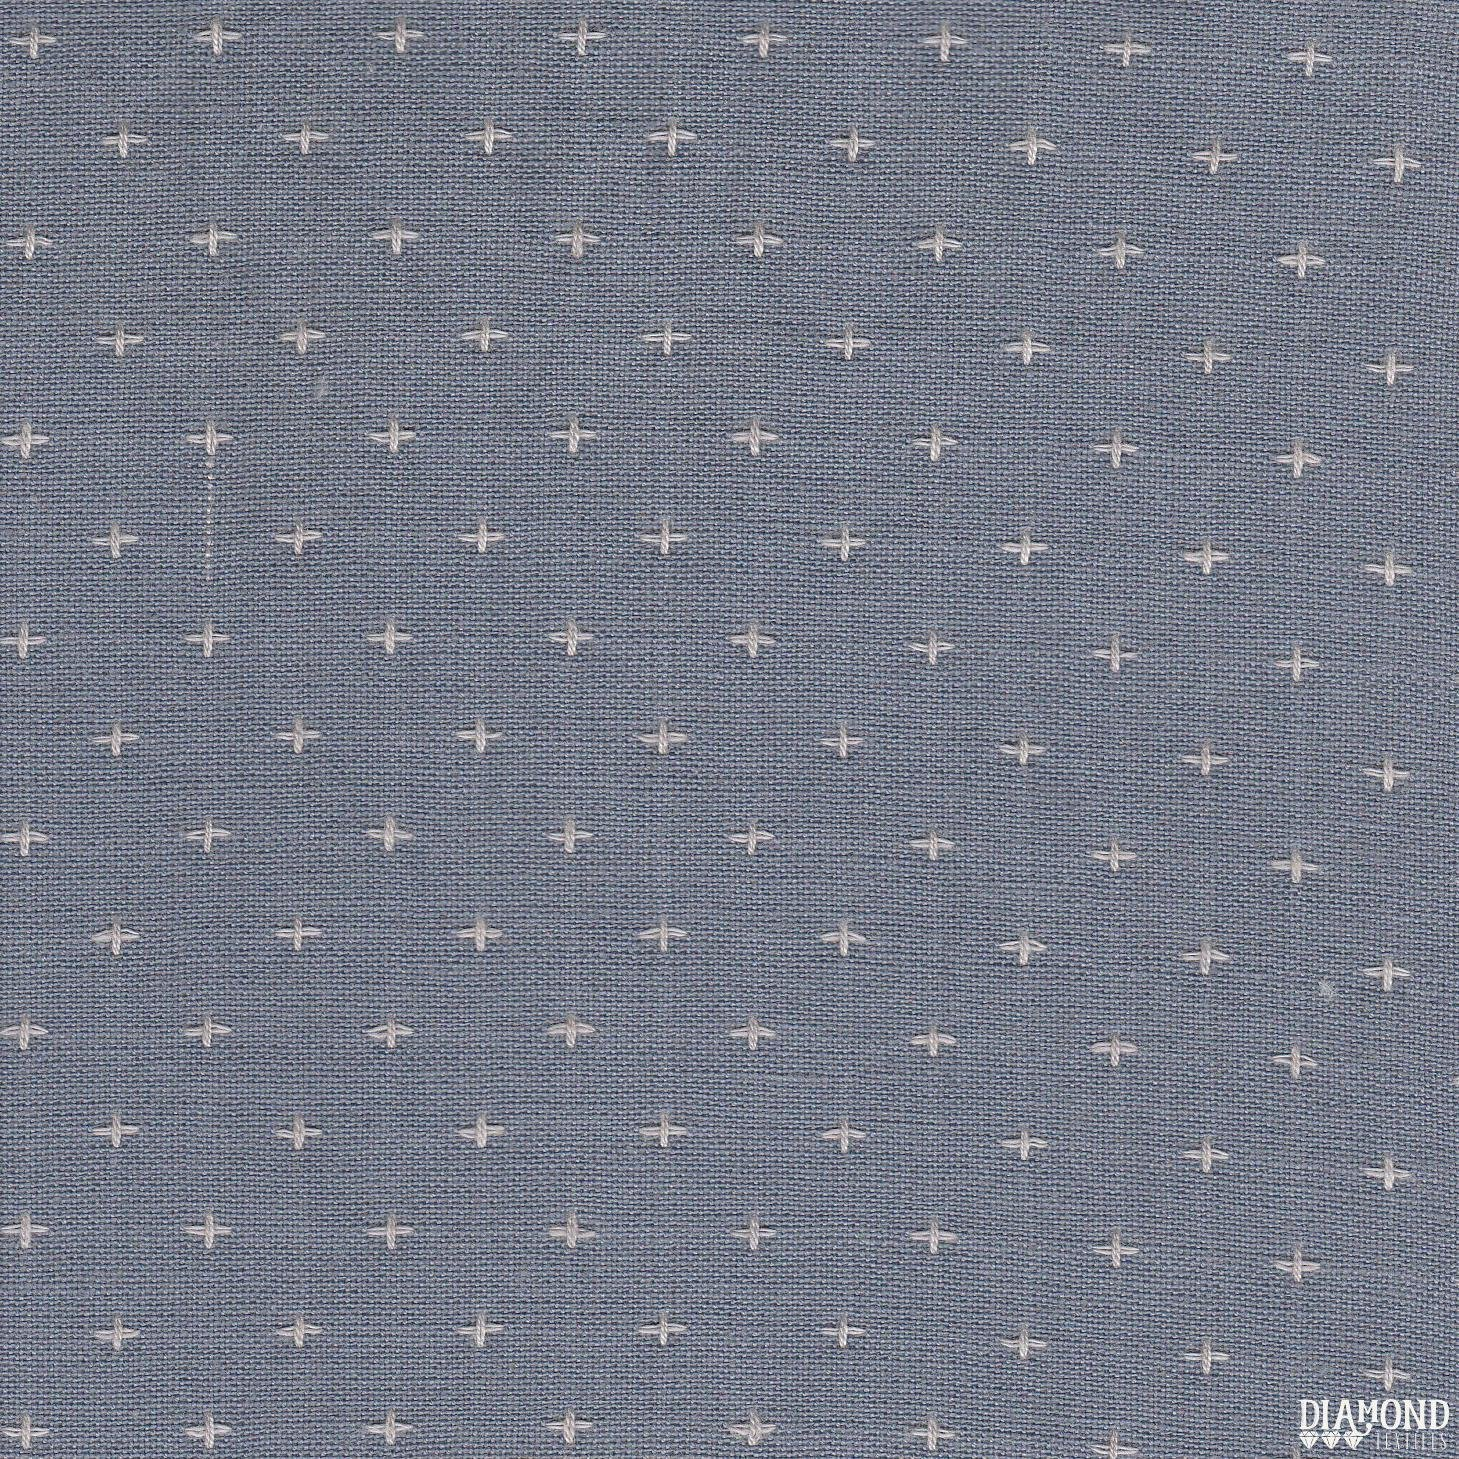 Diamond Textiles/Manchester 3145/Purplish blue with cream stitching